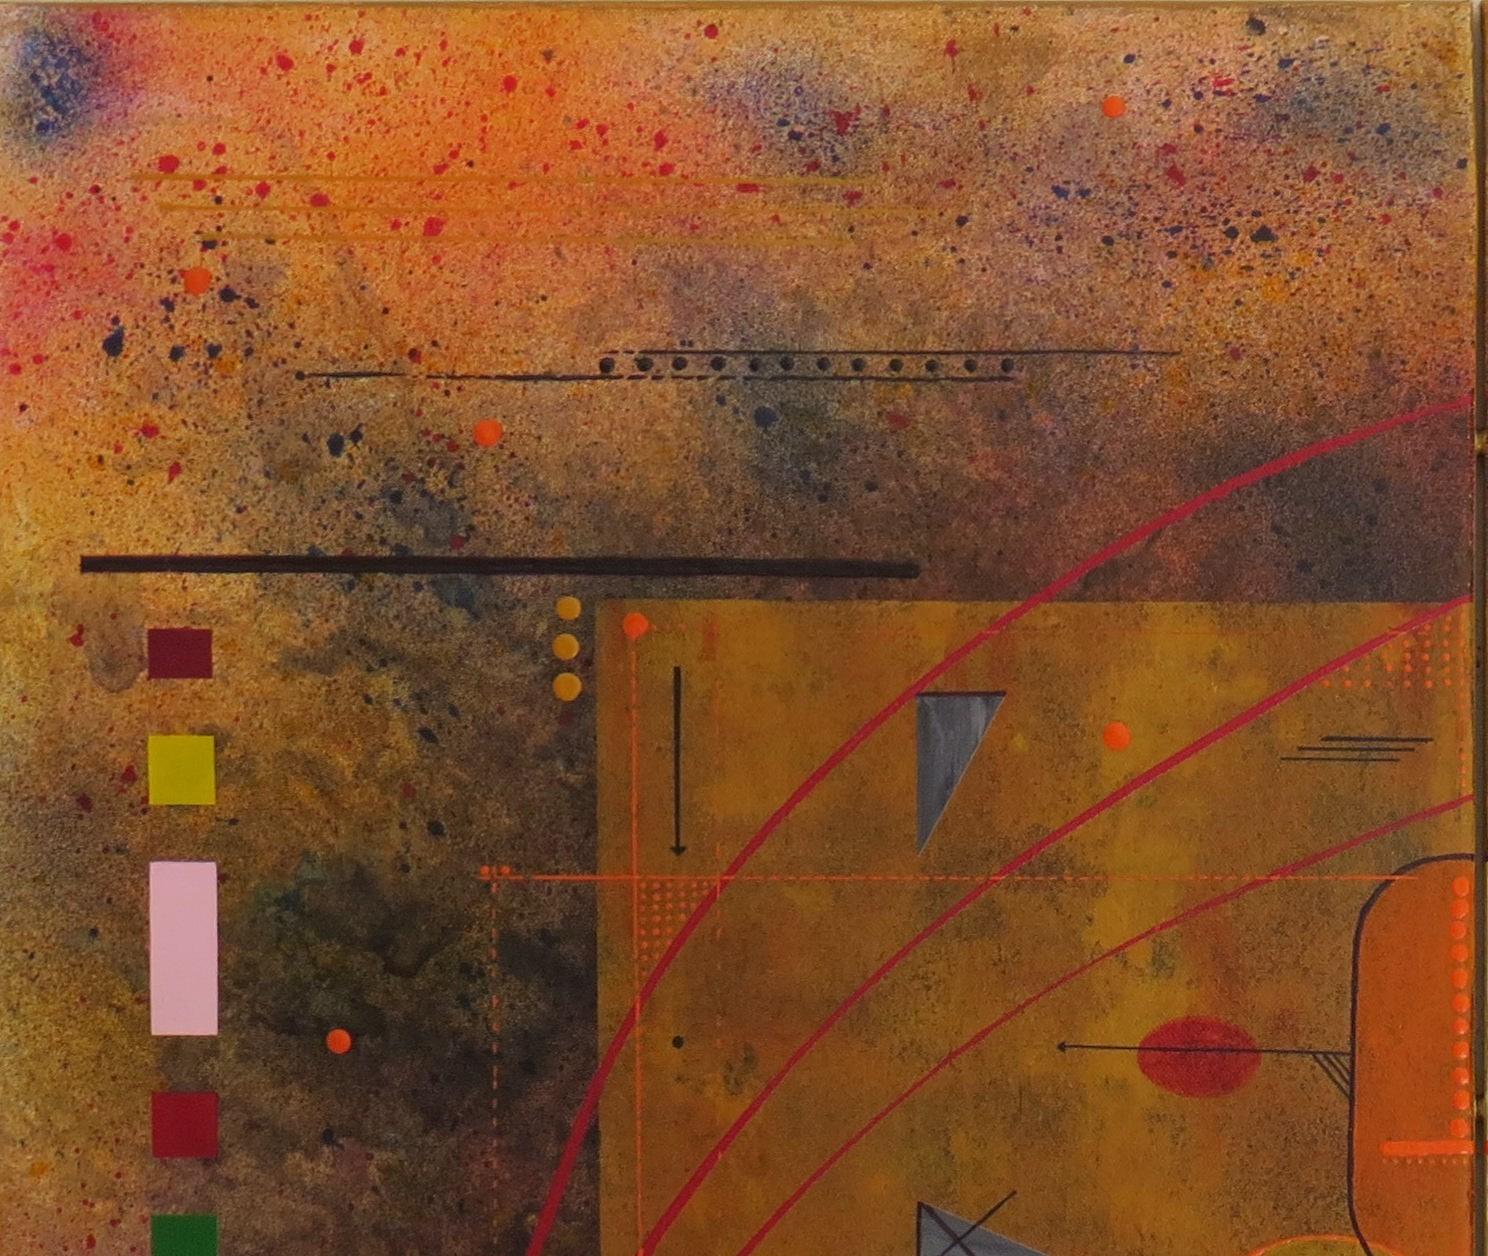 kappa - zoom3 - DALUZ GALEGO - peinture abstraite